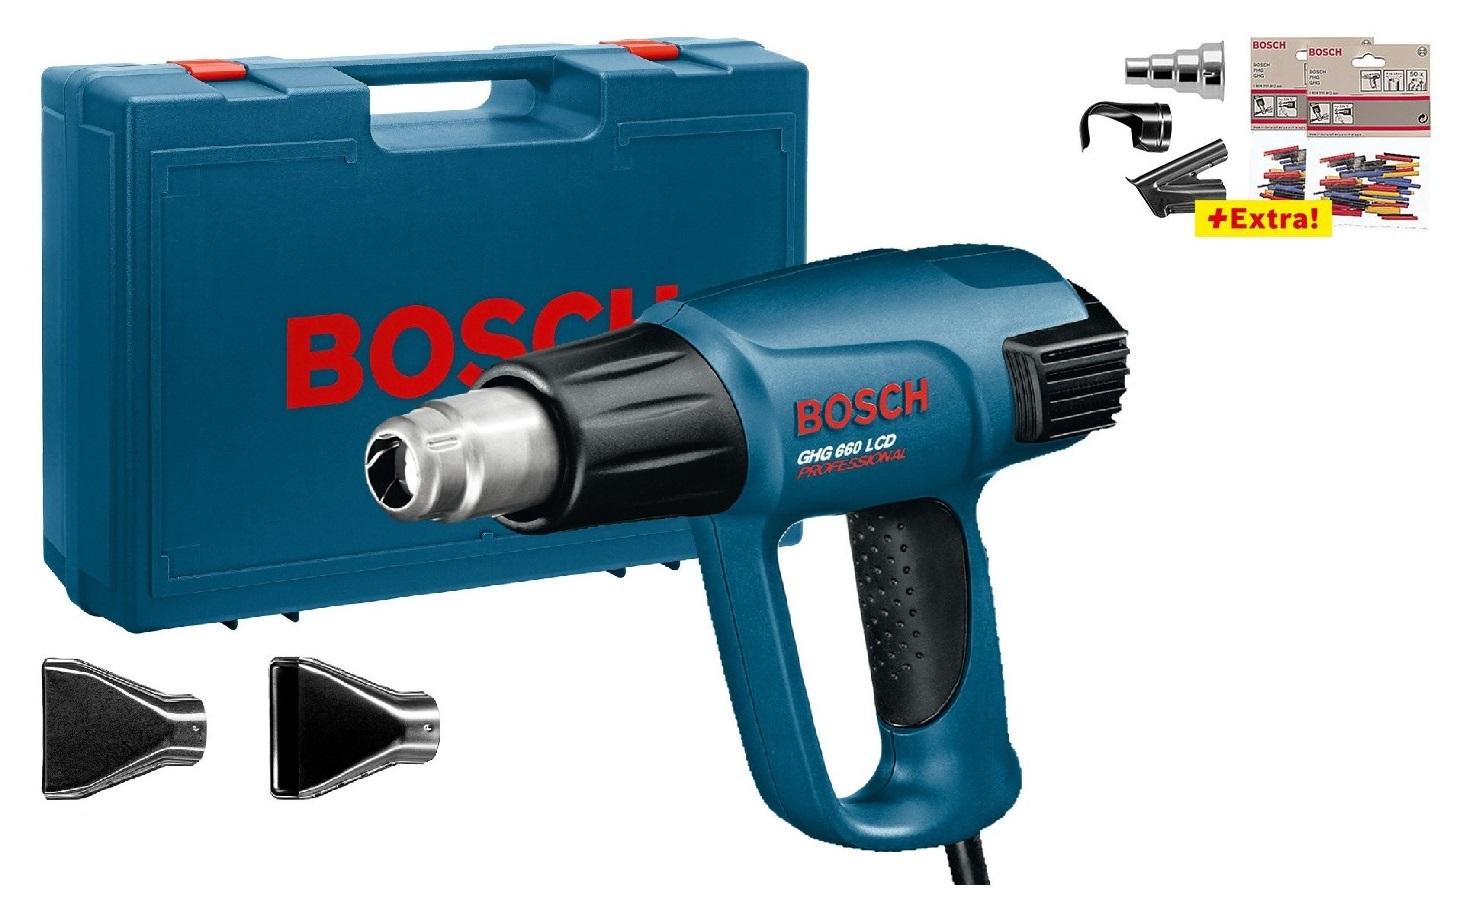 - Bosch GHG 660 LCD Heteluchtpistool + accessoires in koffer